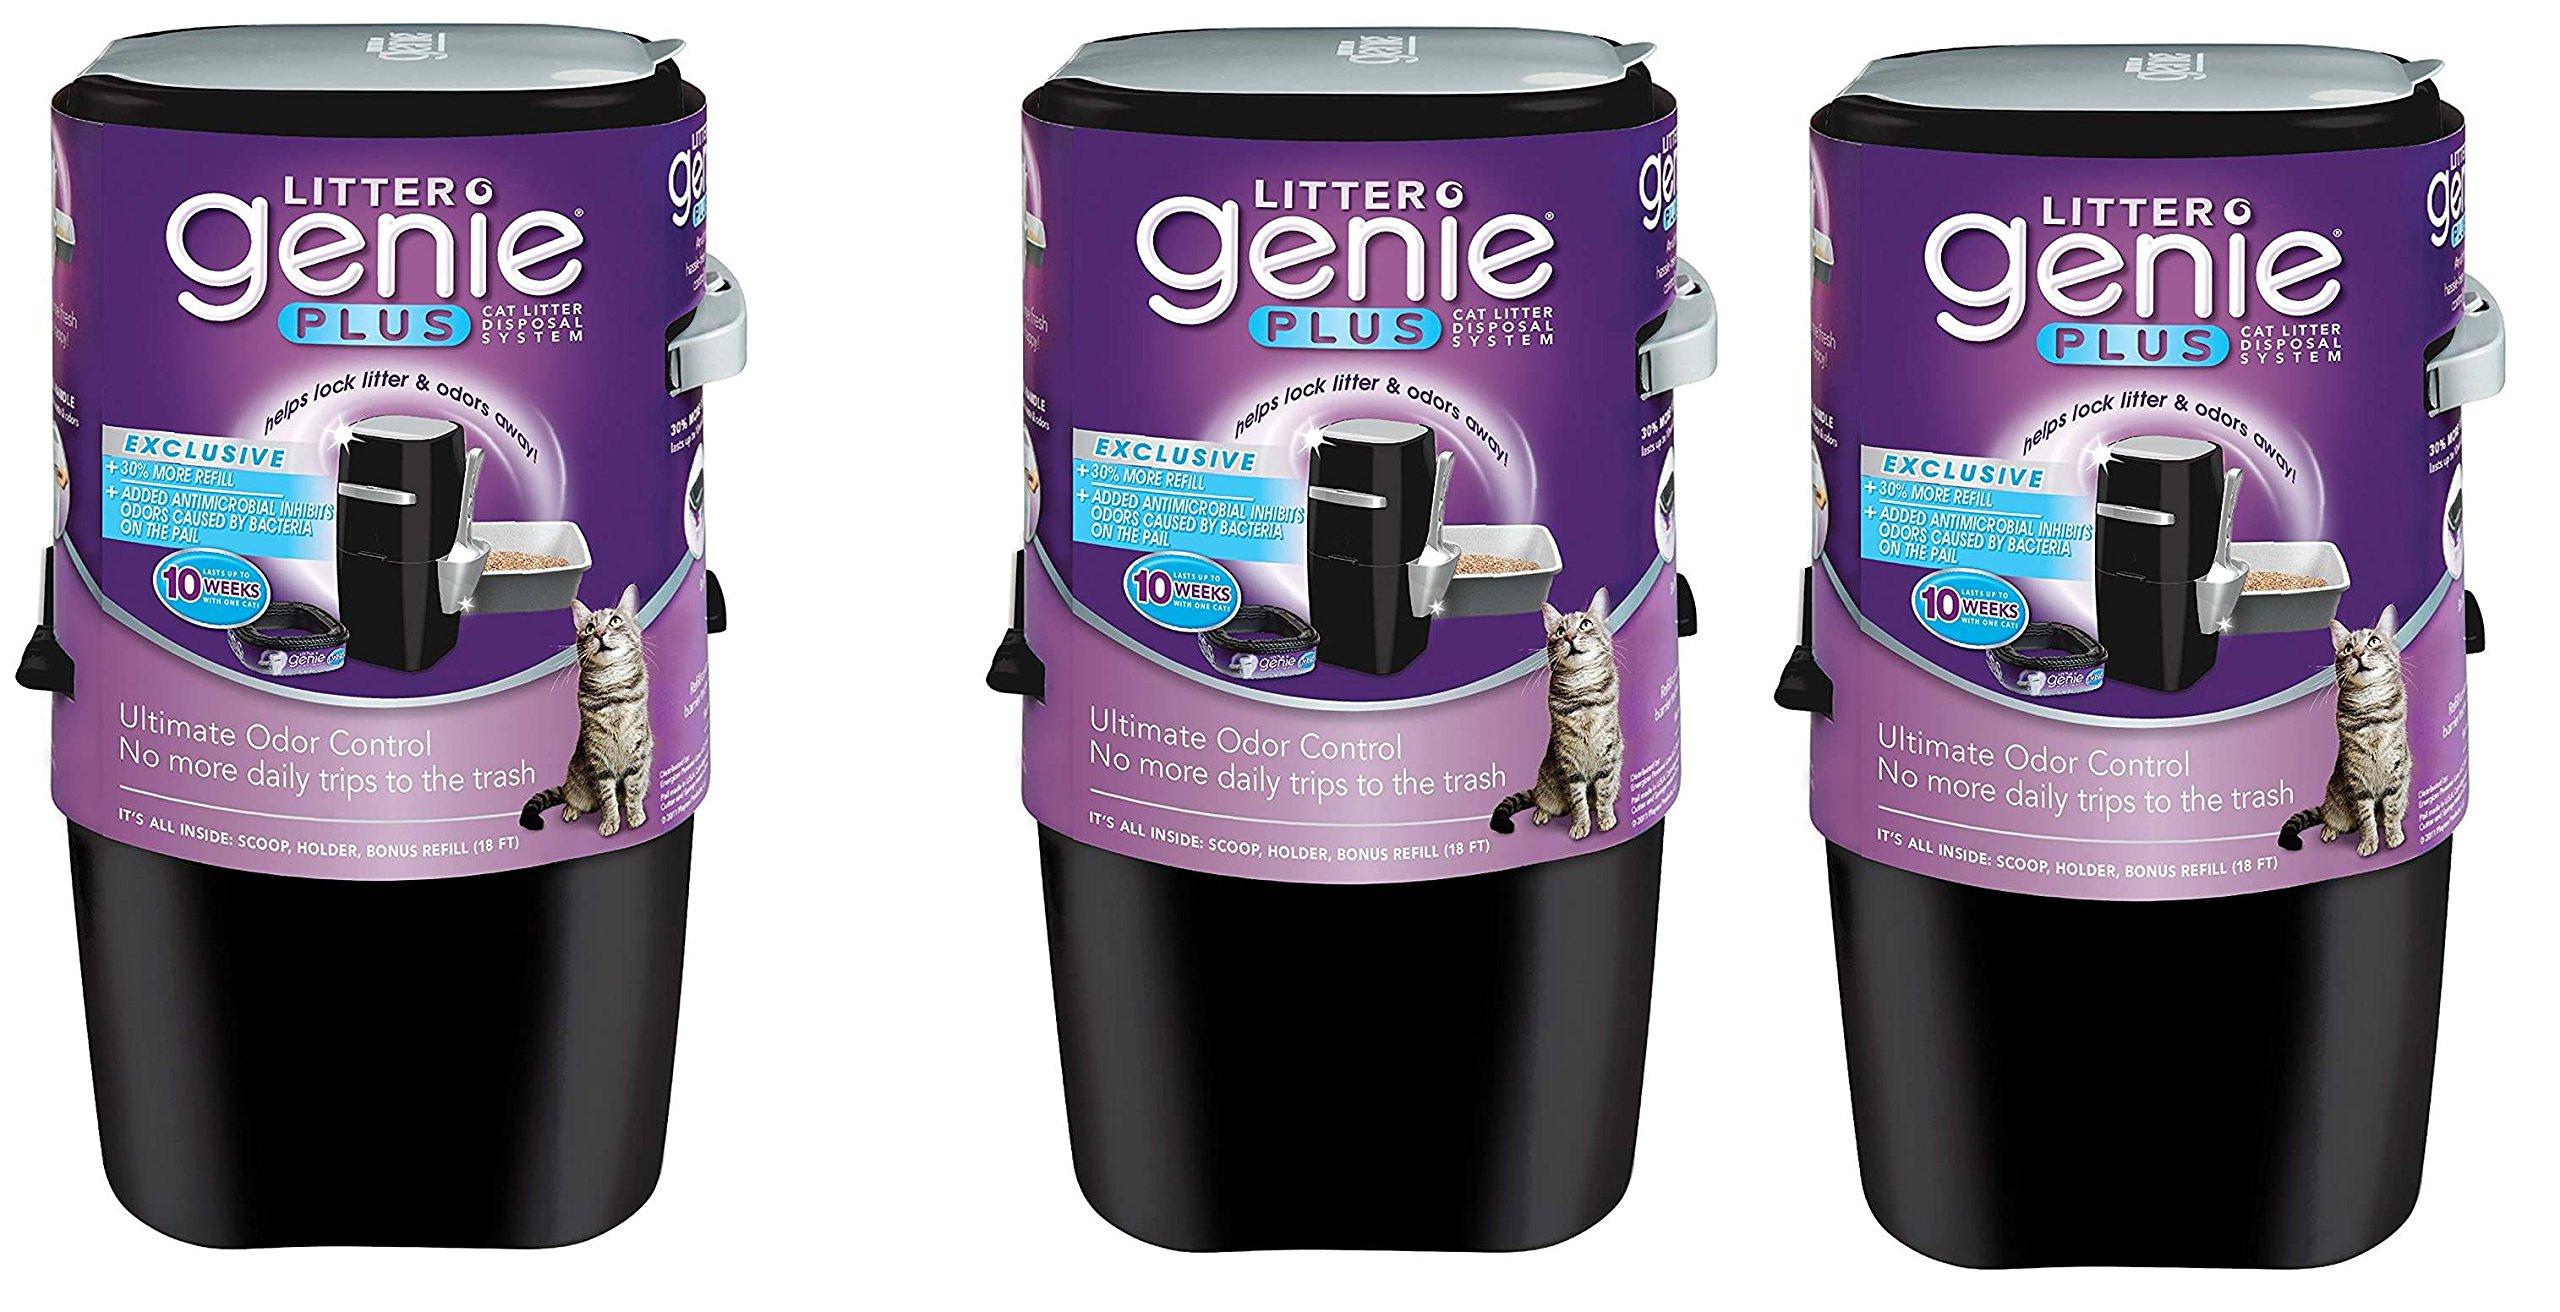 Litter Genie Plus Cat Litter Disposal System mrnasM with Odor Free Pail System EEKOvi, 3 Pack(Black)